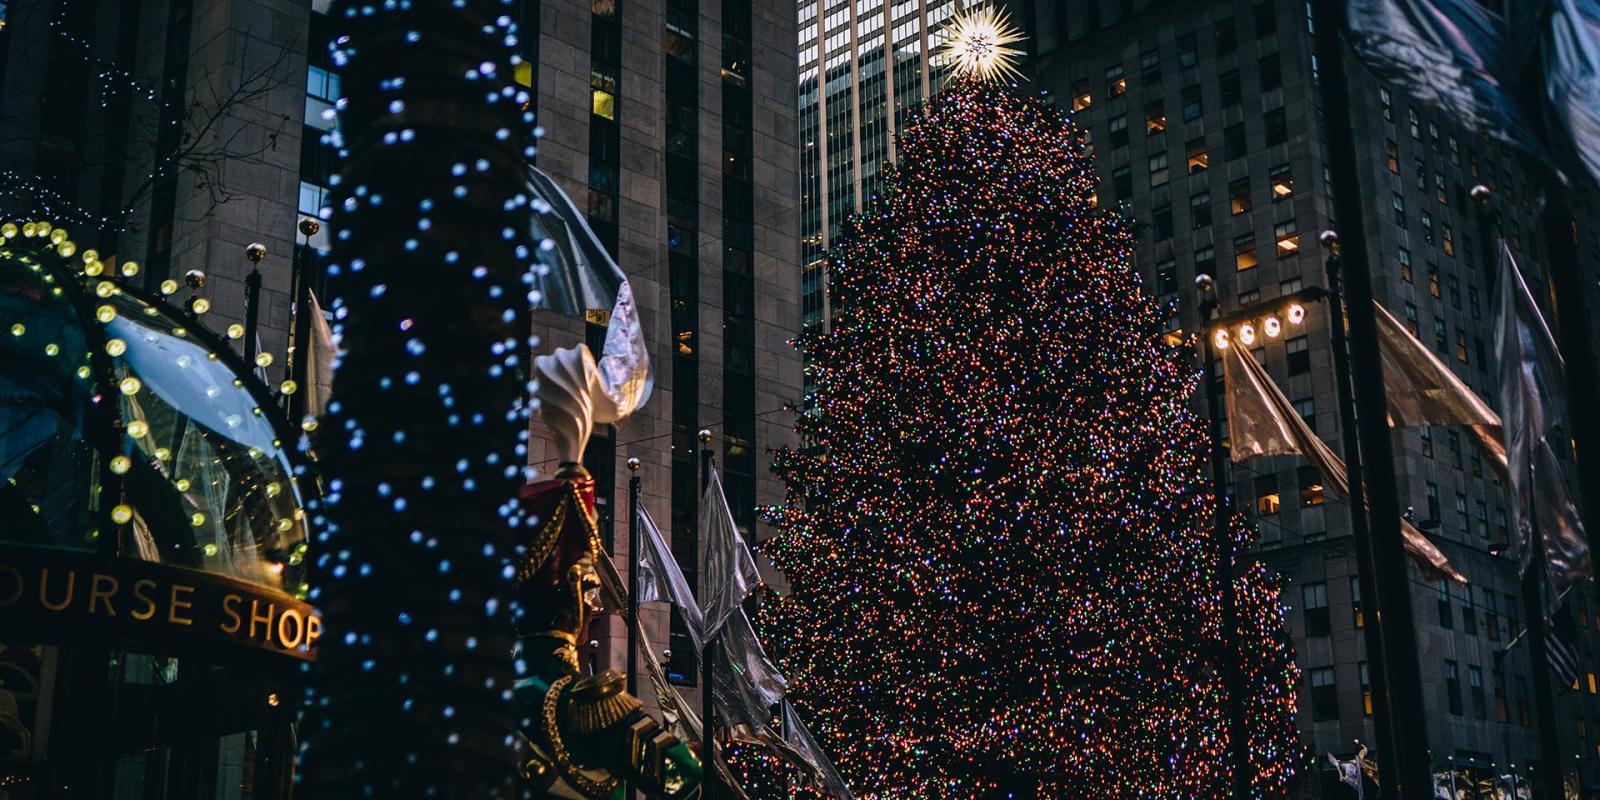 Weihnachtsbaum rockefeller center 2019   Rockefeller Center Holiday Christmas Tree Lighting 2019 ...